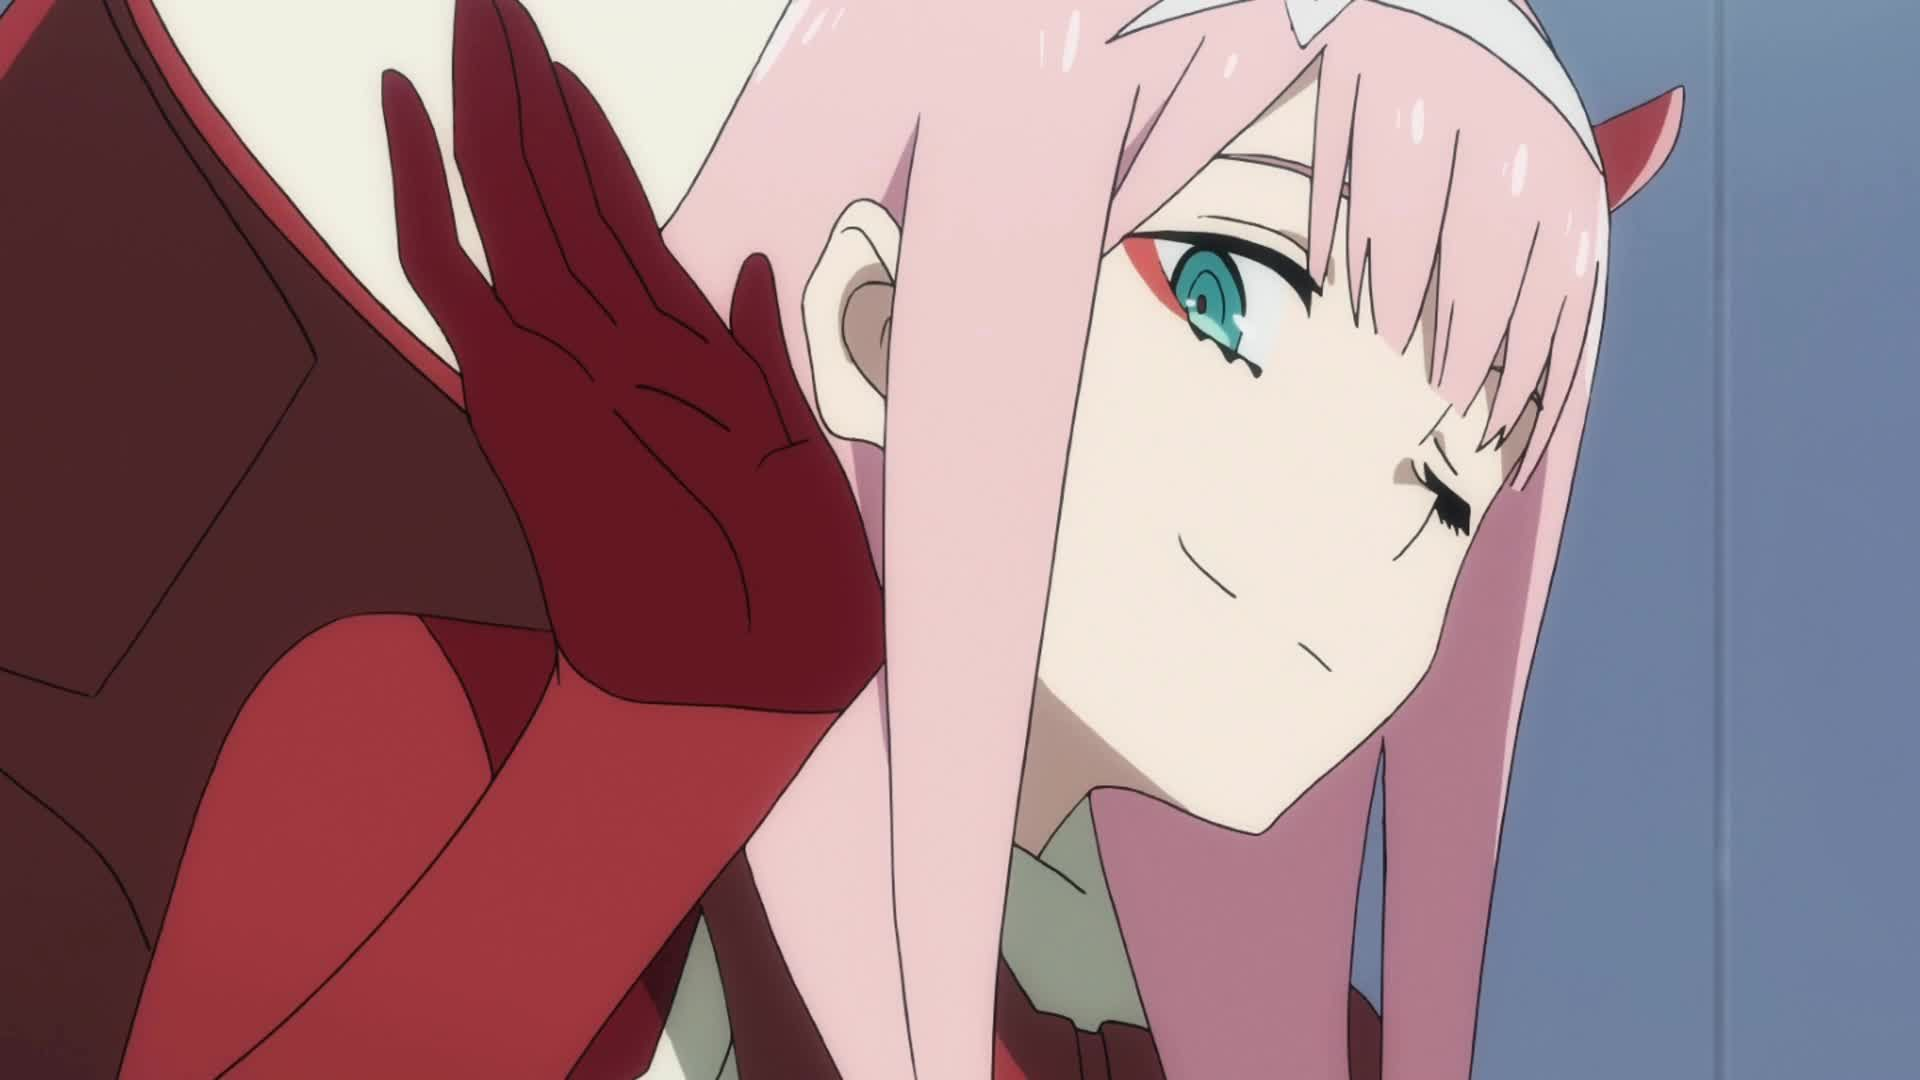 Zero Two Wallpaper Pesquisa Google Anime Smile Darling In The Franxx Anime